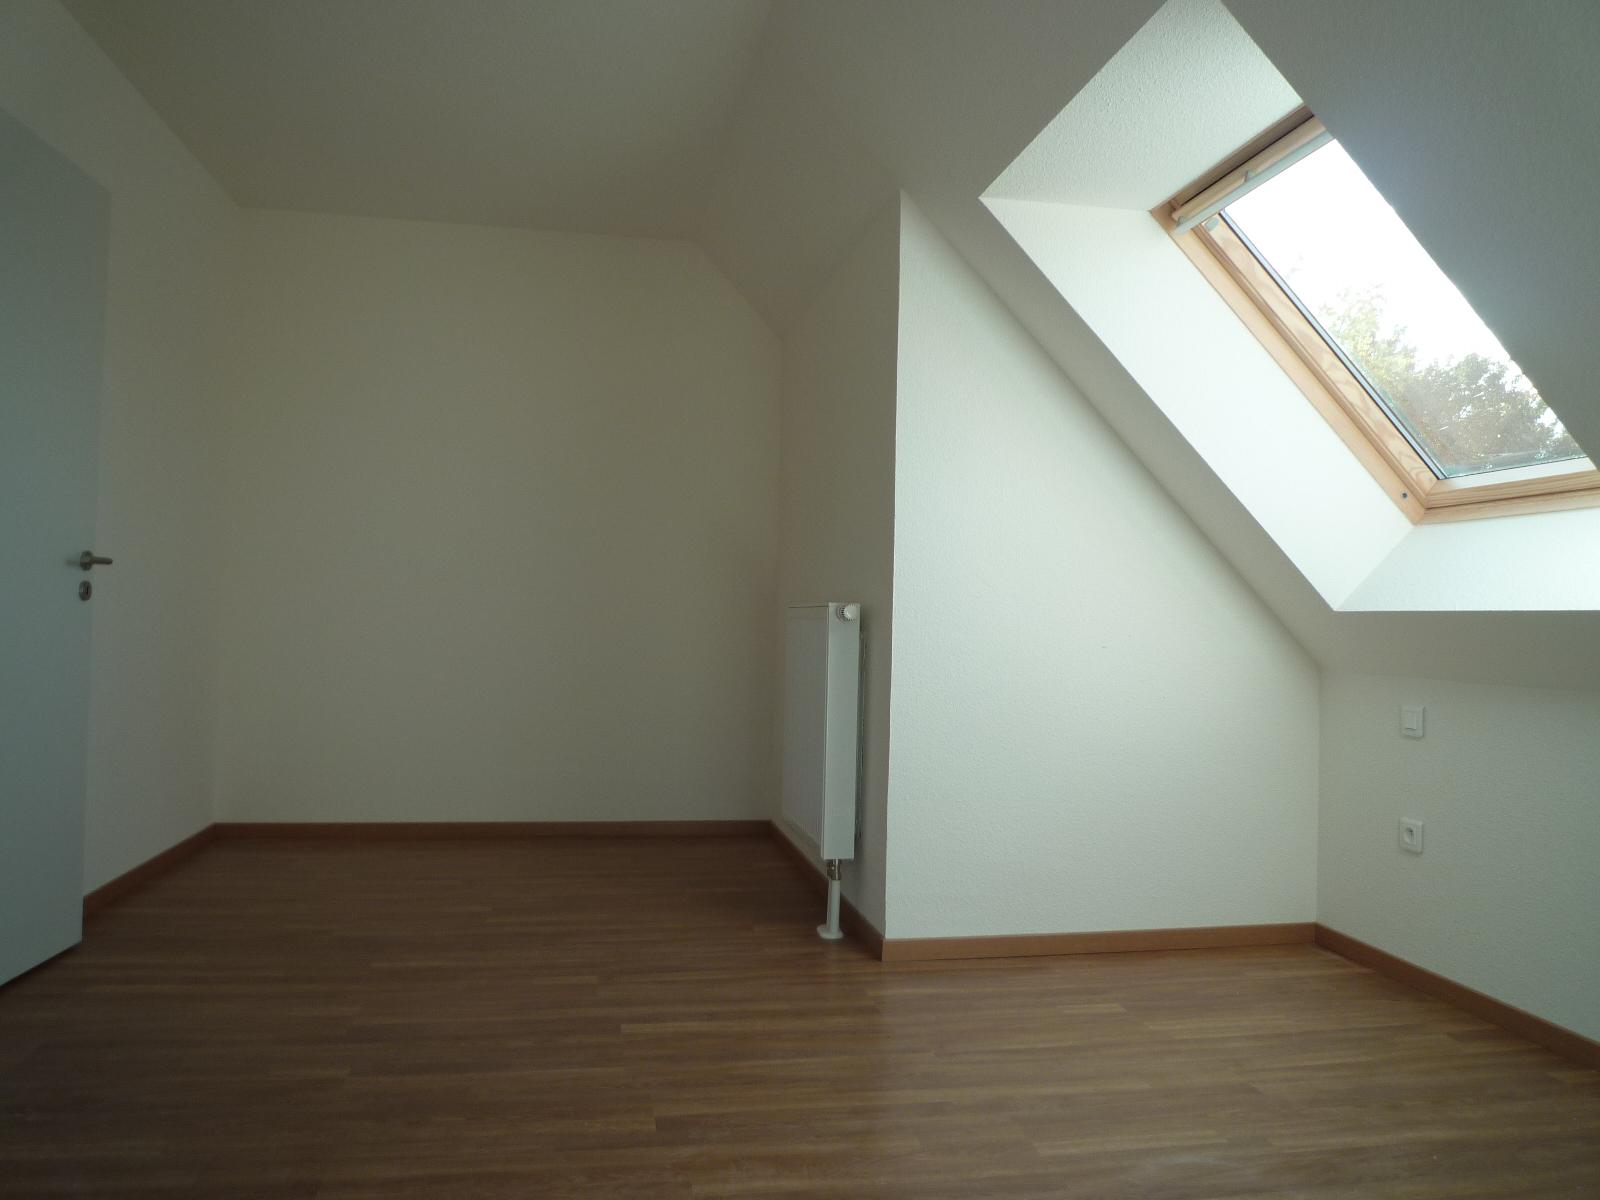 Eligible loi Pinel 21% - LINGOLSHEIM - nos maisons & appartements neufs - Beausite Immobilier 1